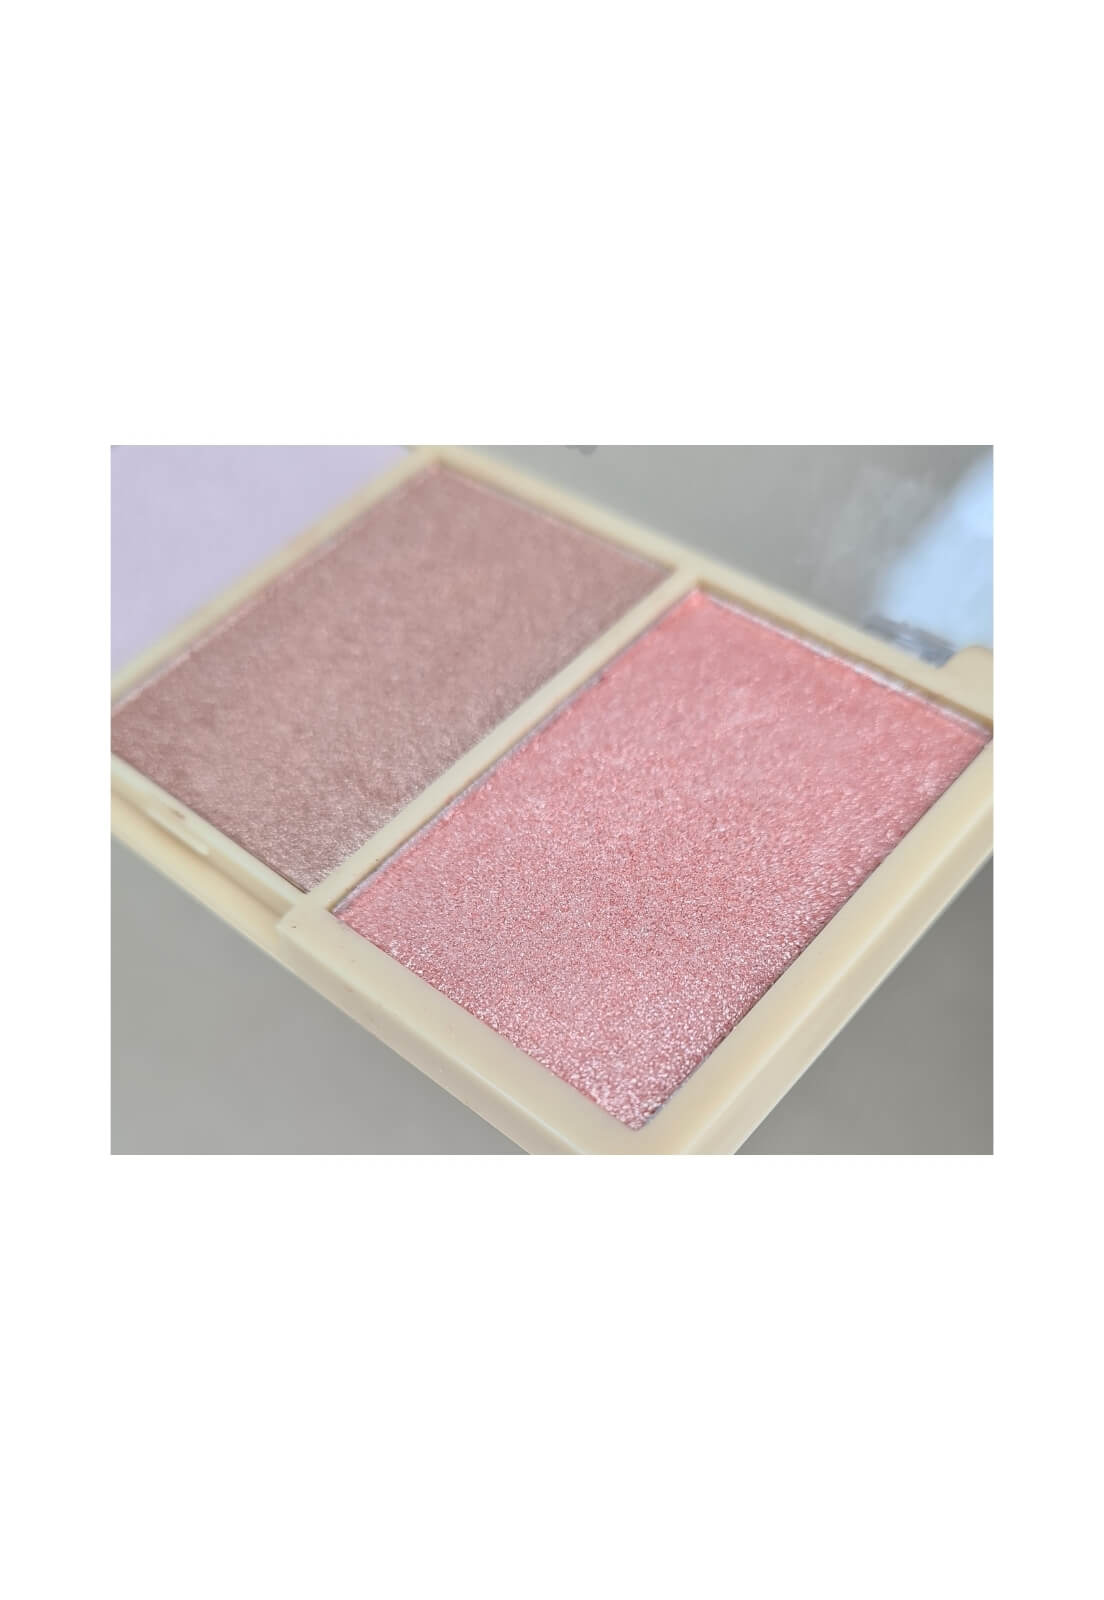 Paleta de iluminador Ruby Rose Glowing mini kit cor 4